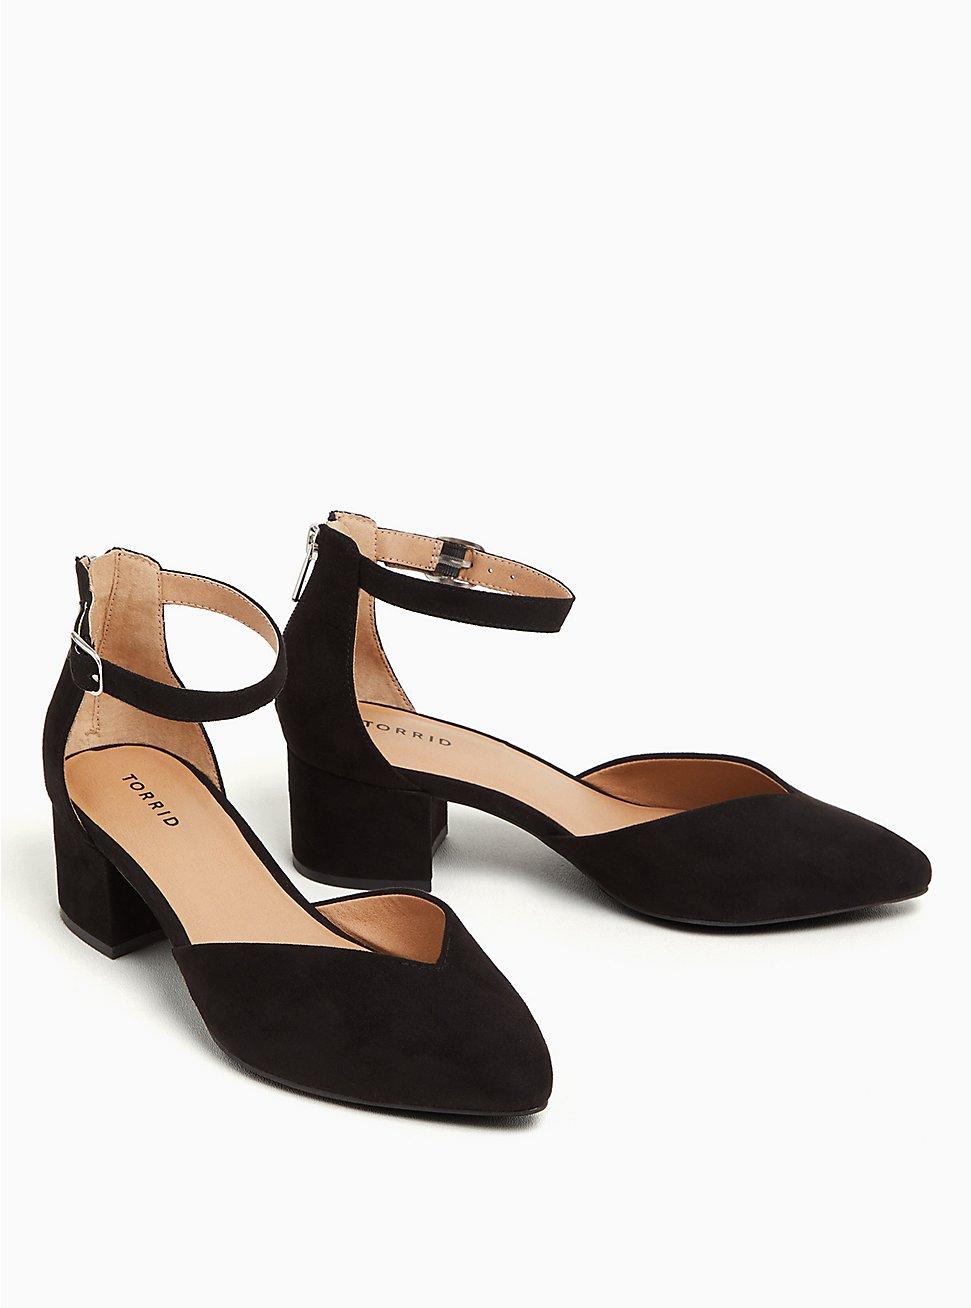 Black Faux Suede V-Cut Pointed Block Heel (WW), BLACK, hi-res